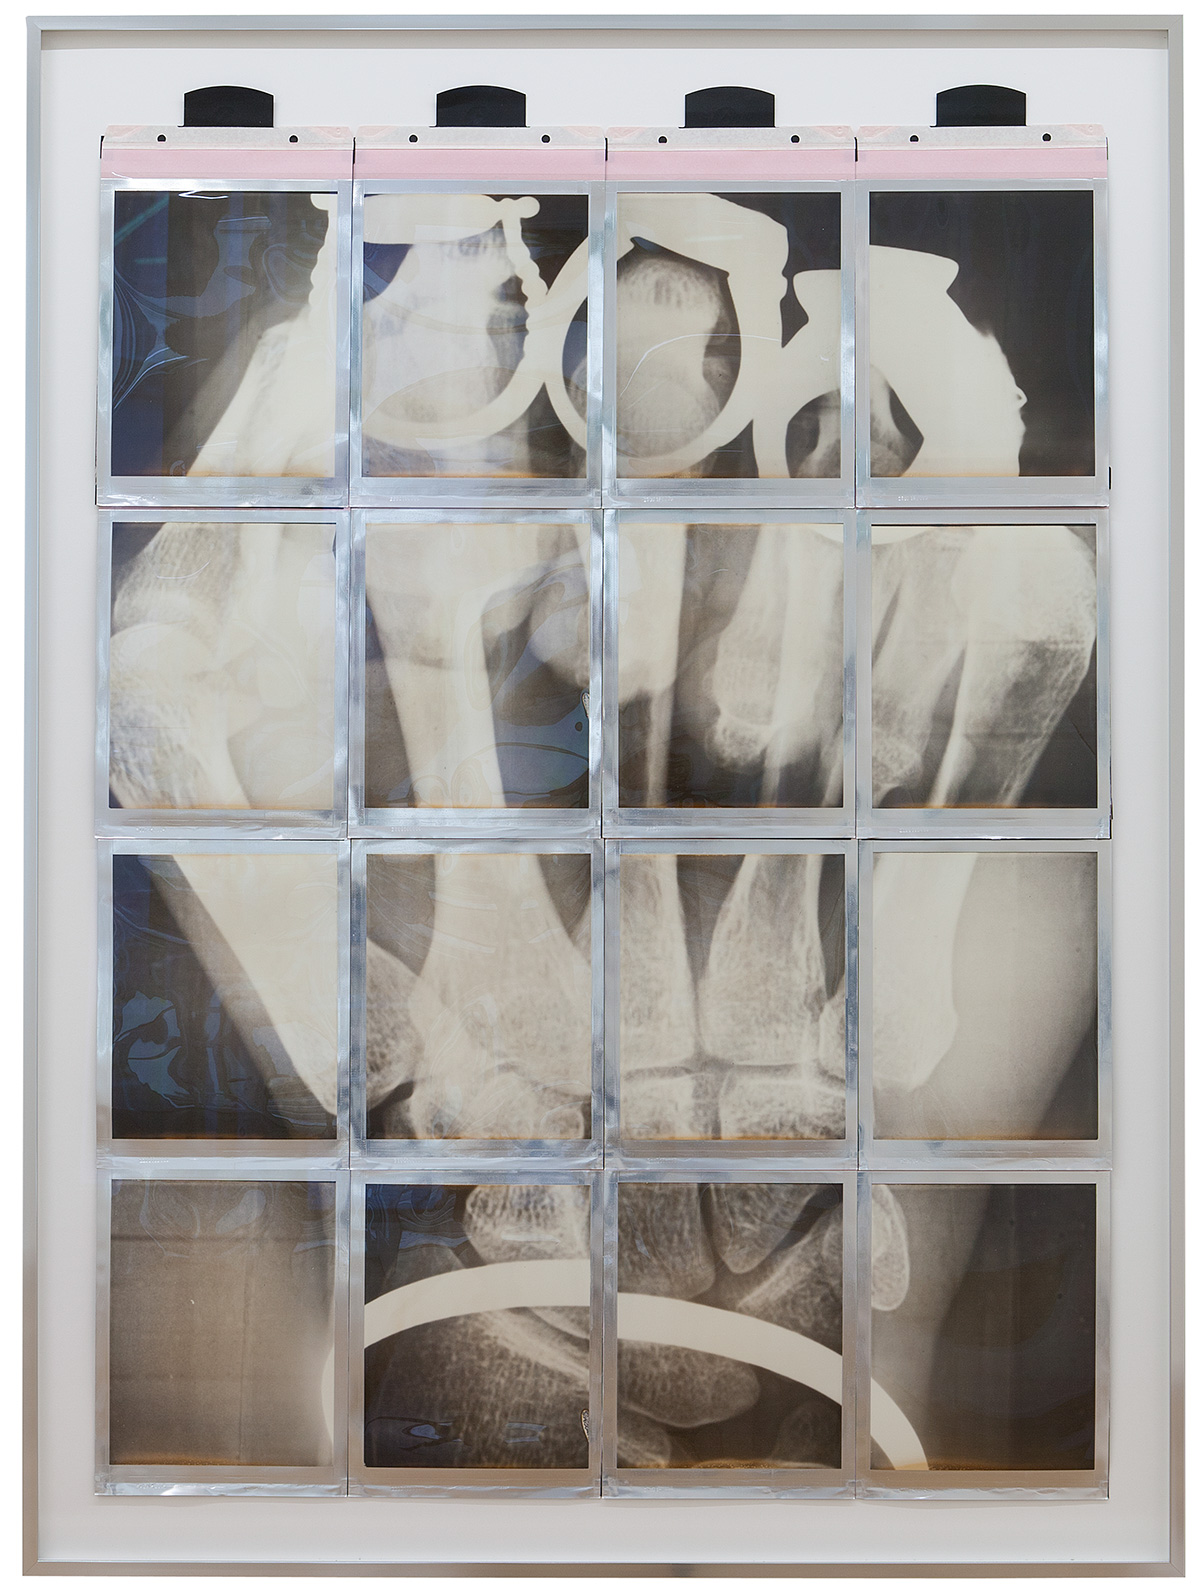 Beaudemont Macchia Aperta polaroid xray Artemis Fontana